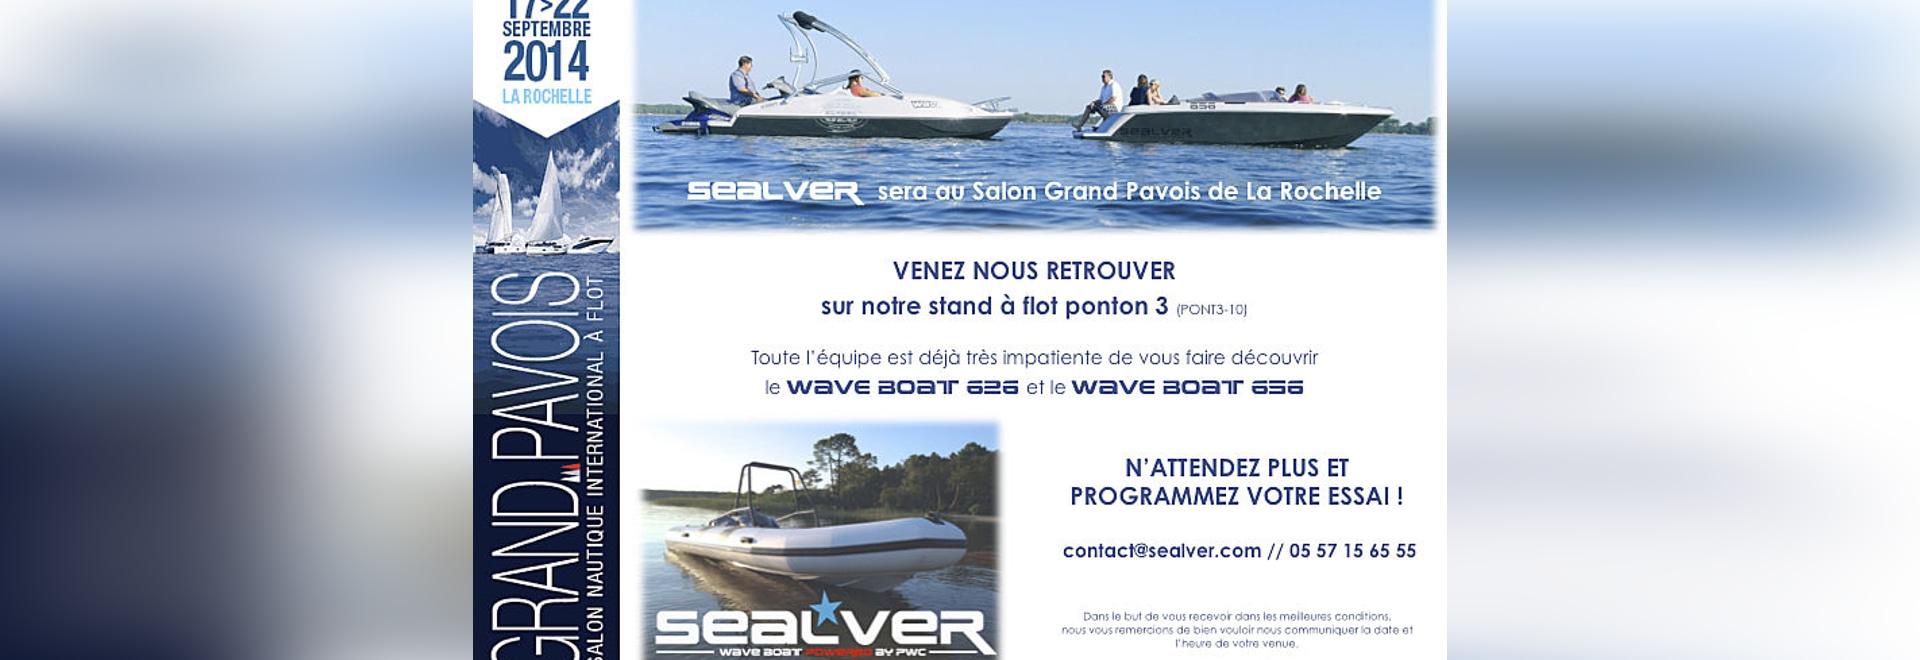 "The Wave Boat in ""Le Grand Pavois"" in La Rochelle"